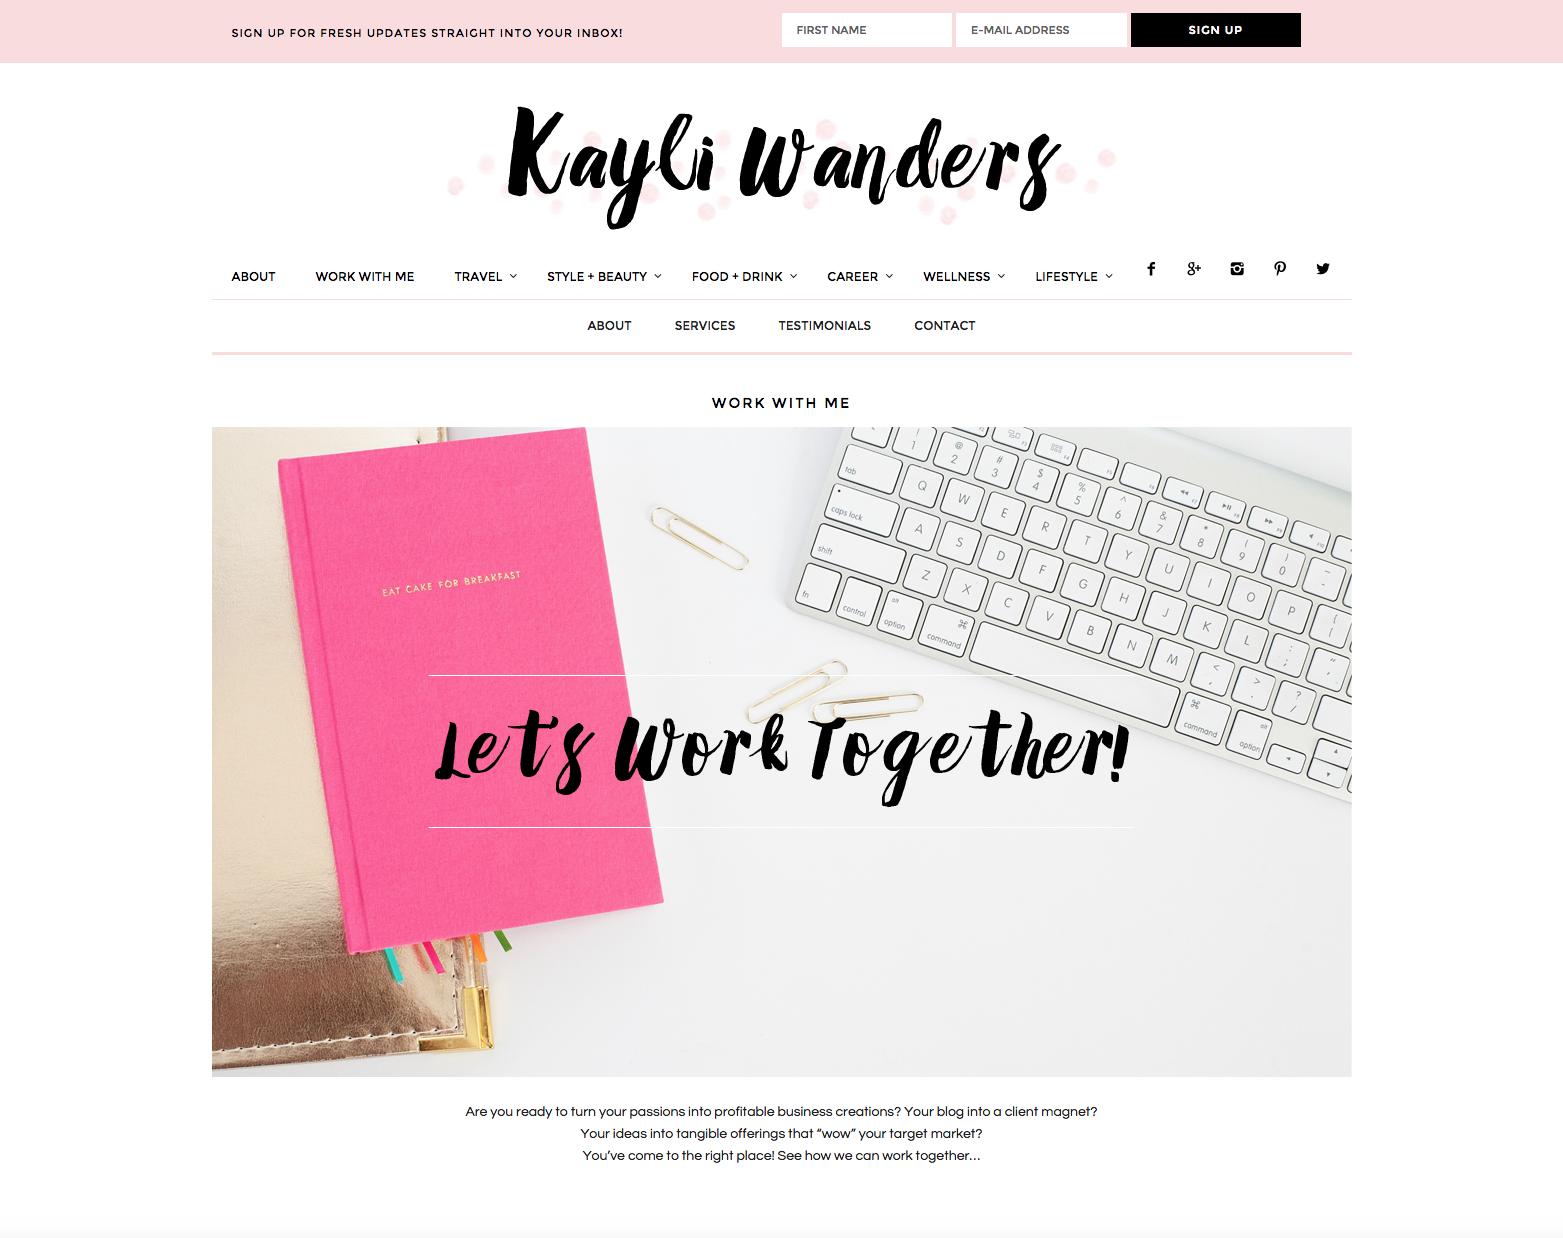 KW-WorkWithMe-FGD